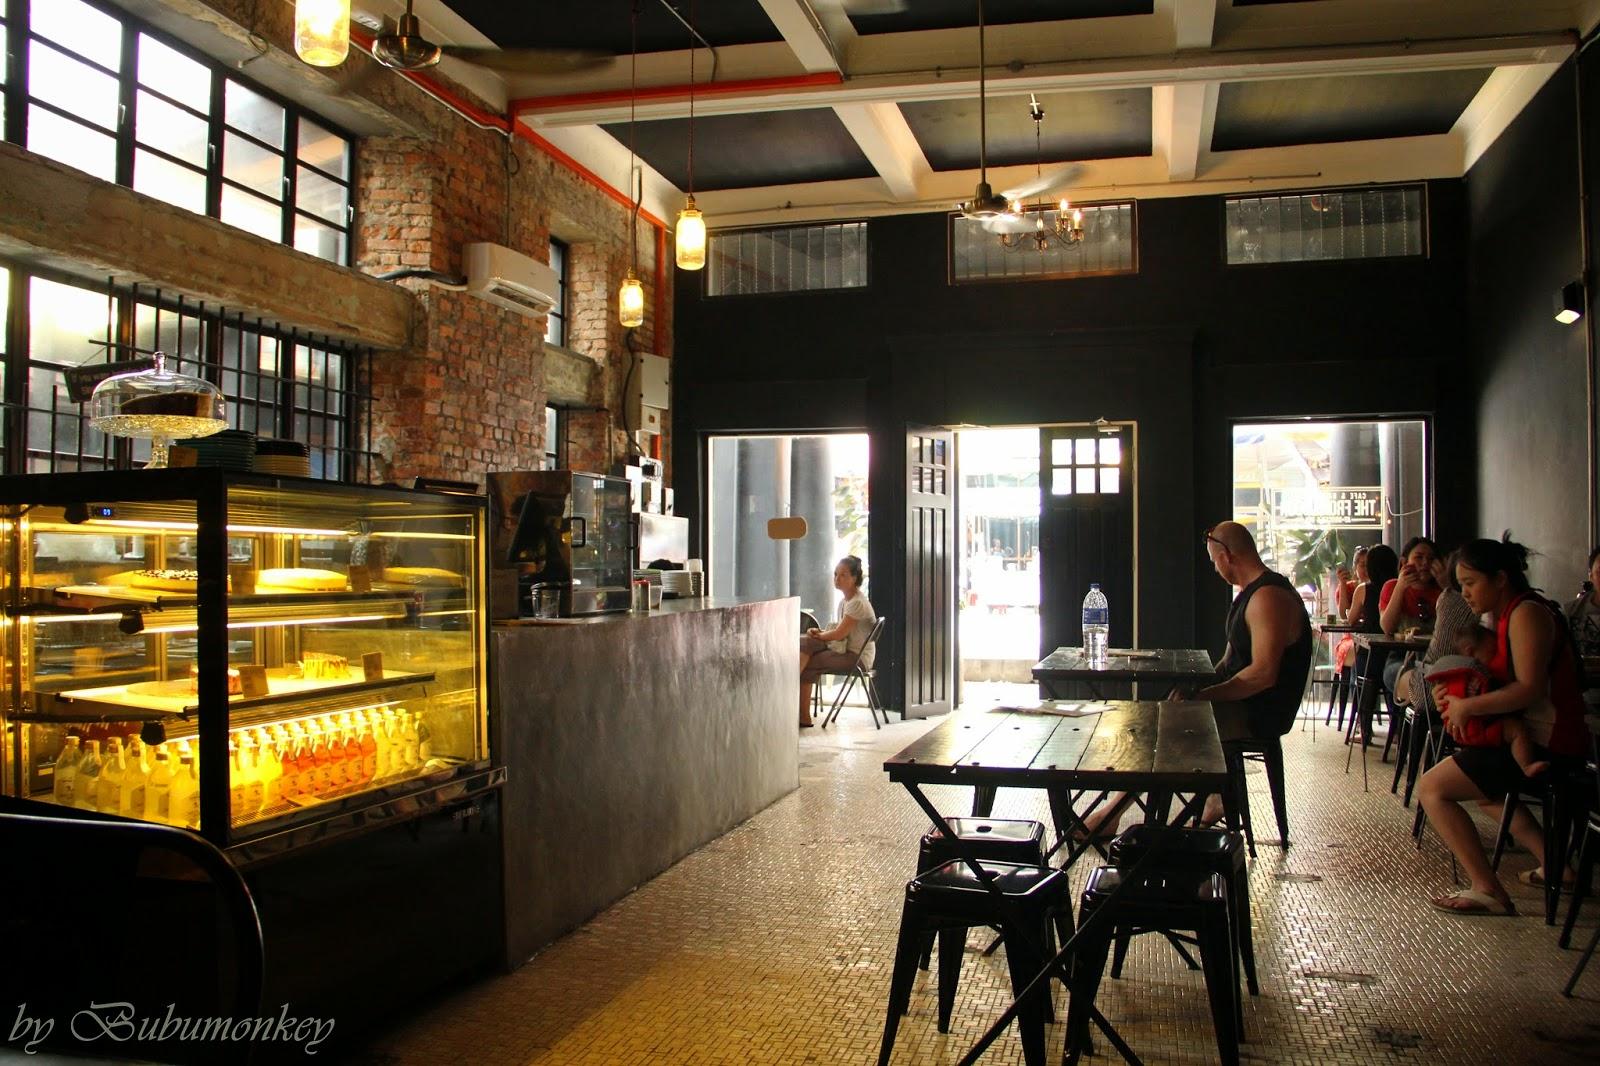 monkeY eYe: The Front Door Cafe @ Grocer's Inn, Jalan Sultan